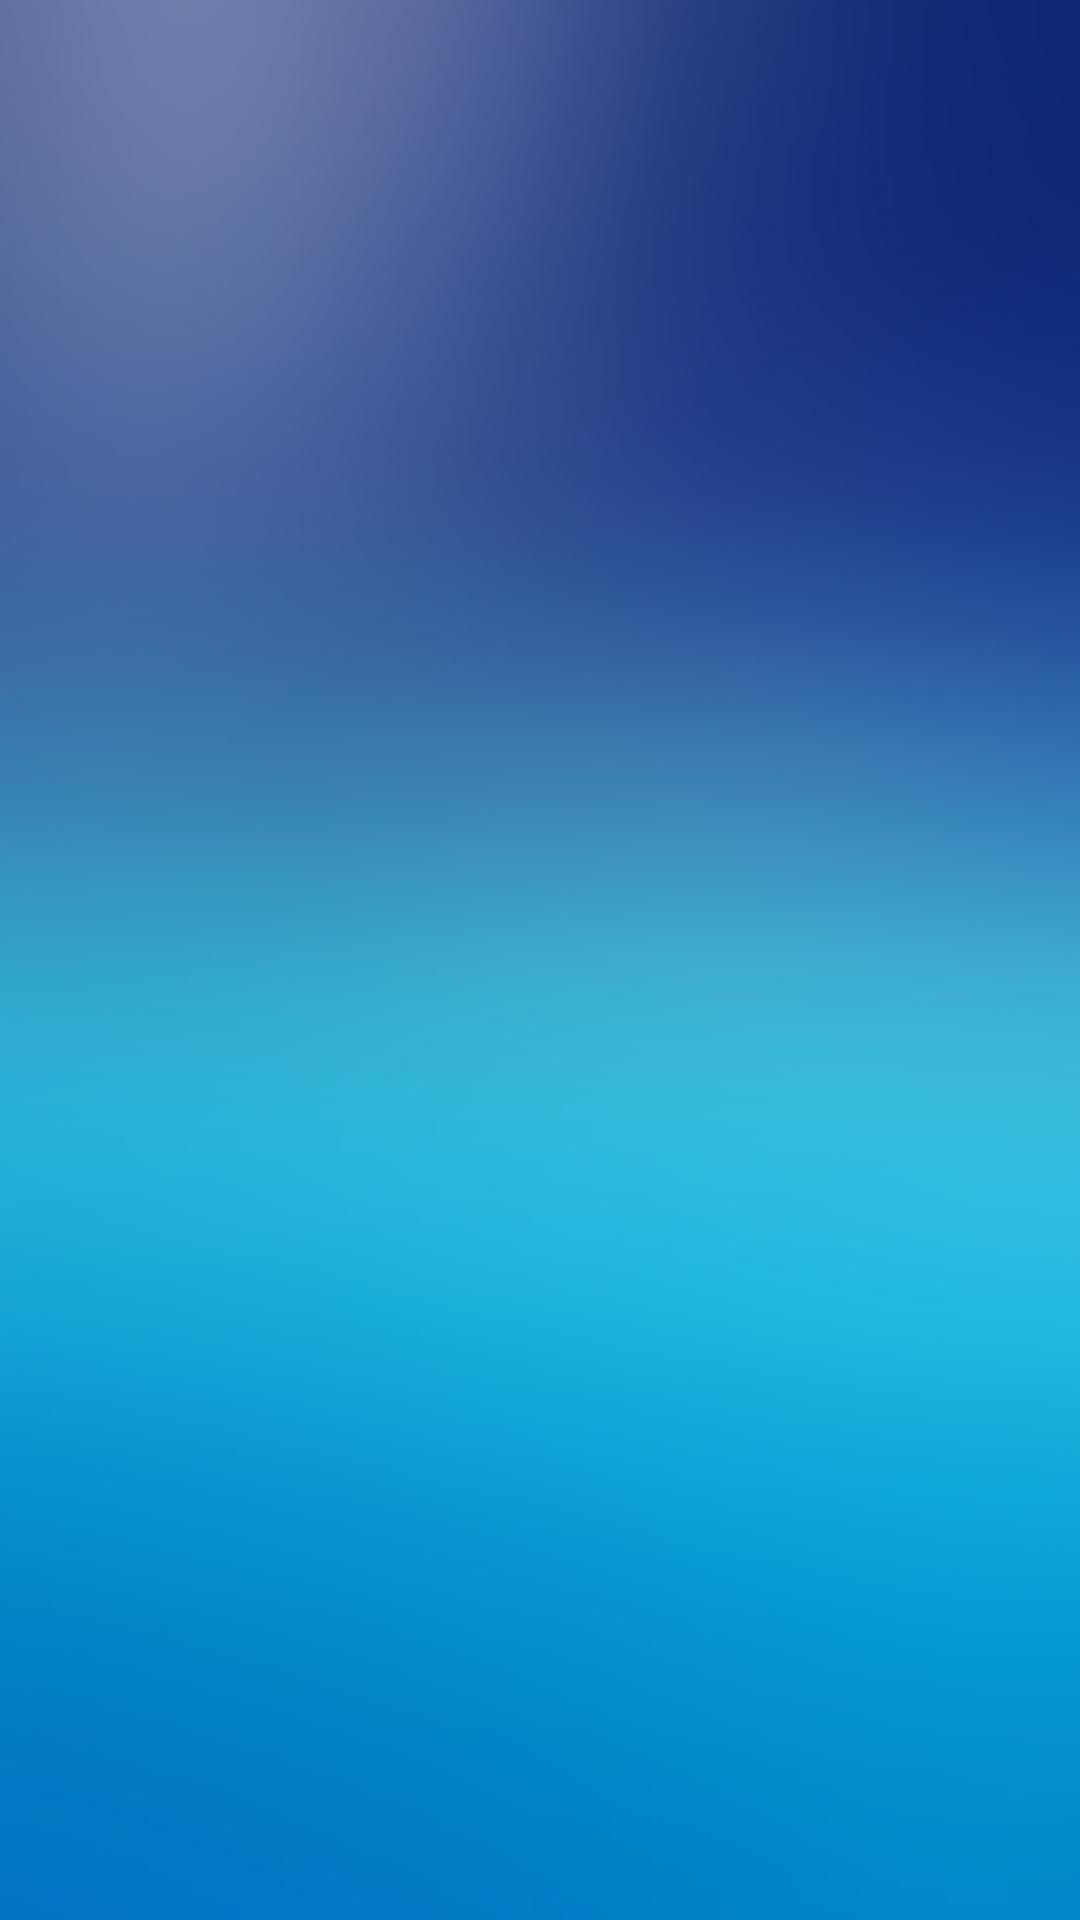 The Iphone Retina Wallpaper I Like Wallpaper Iphone 6 Wallpaper